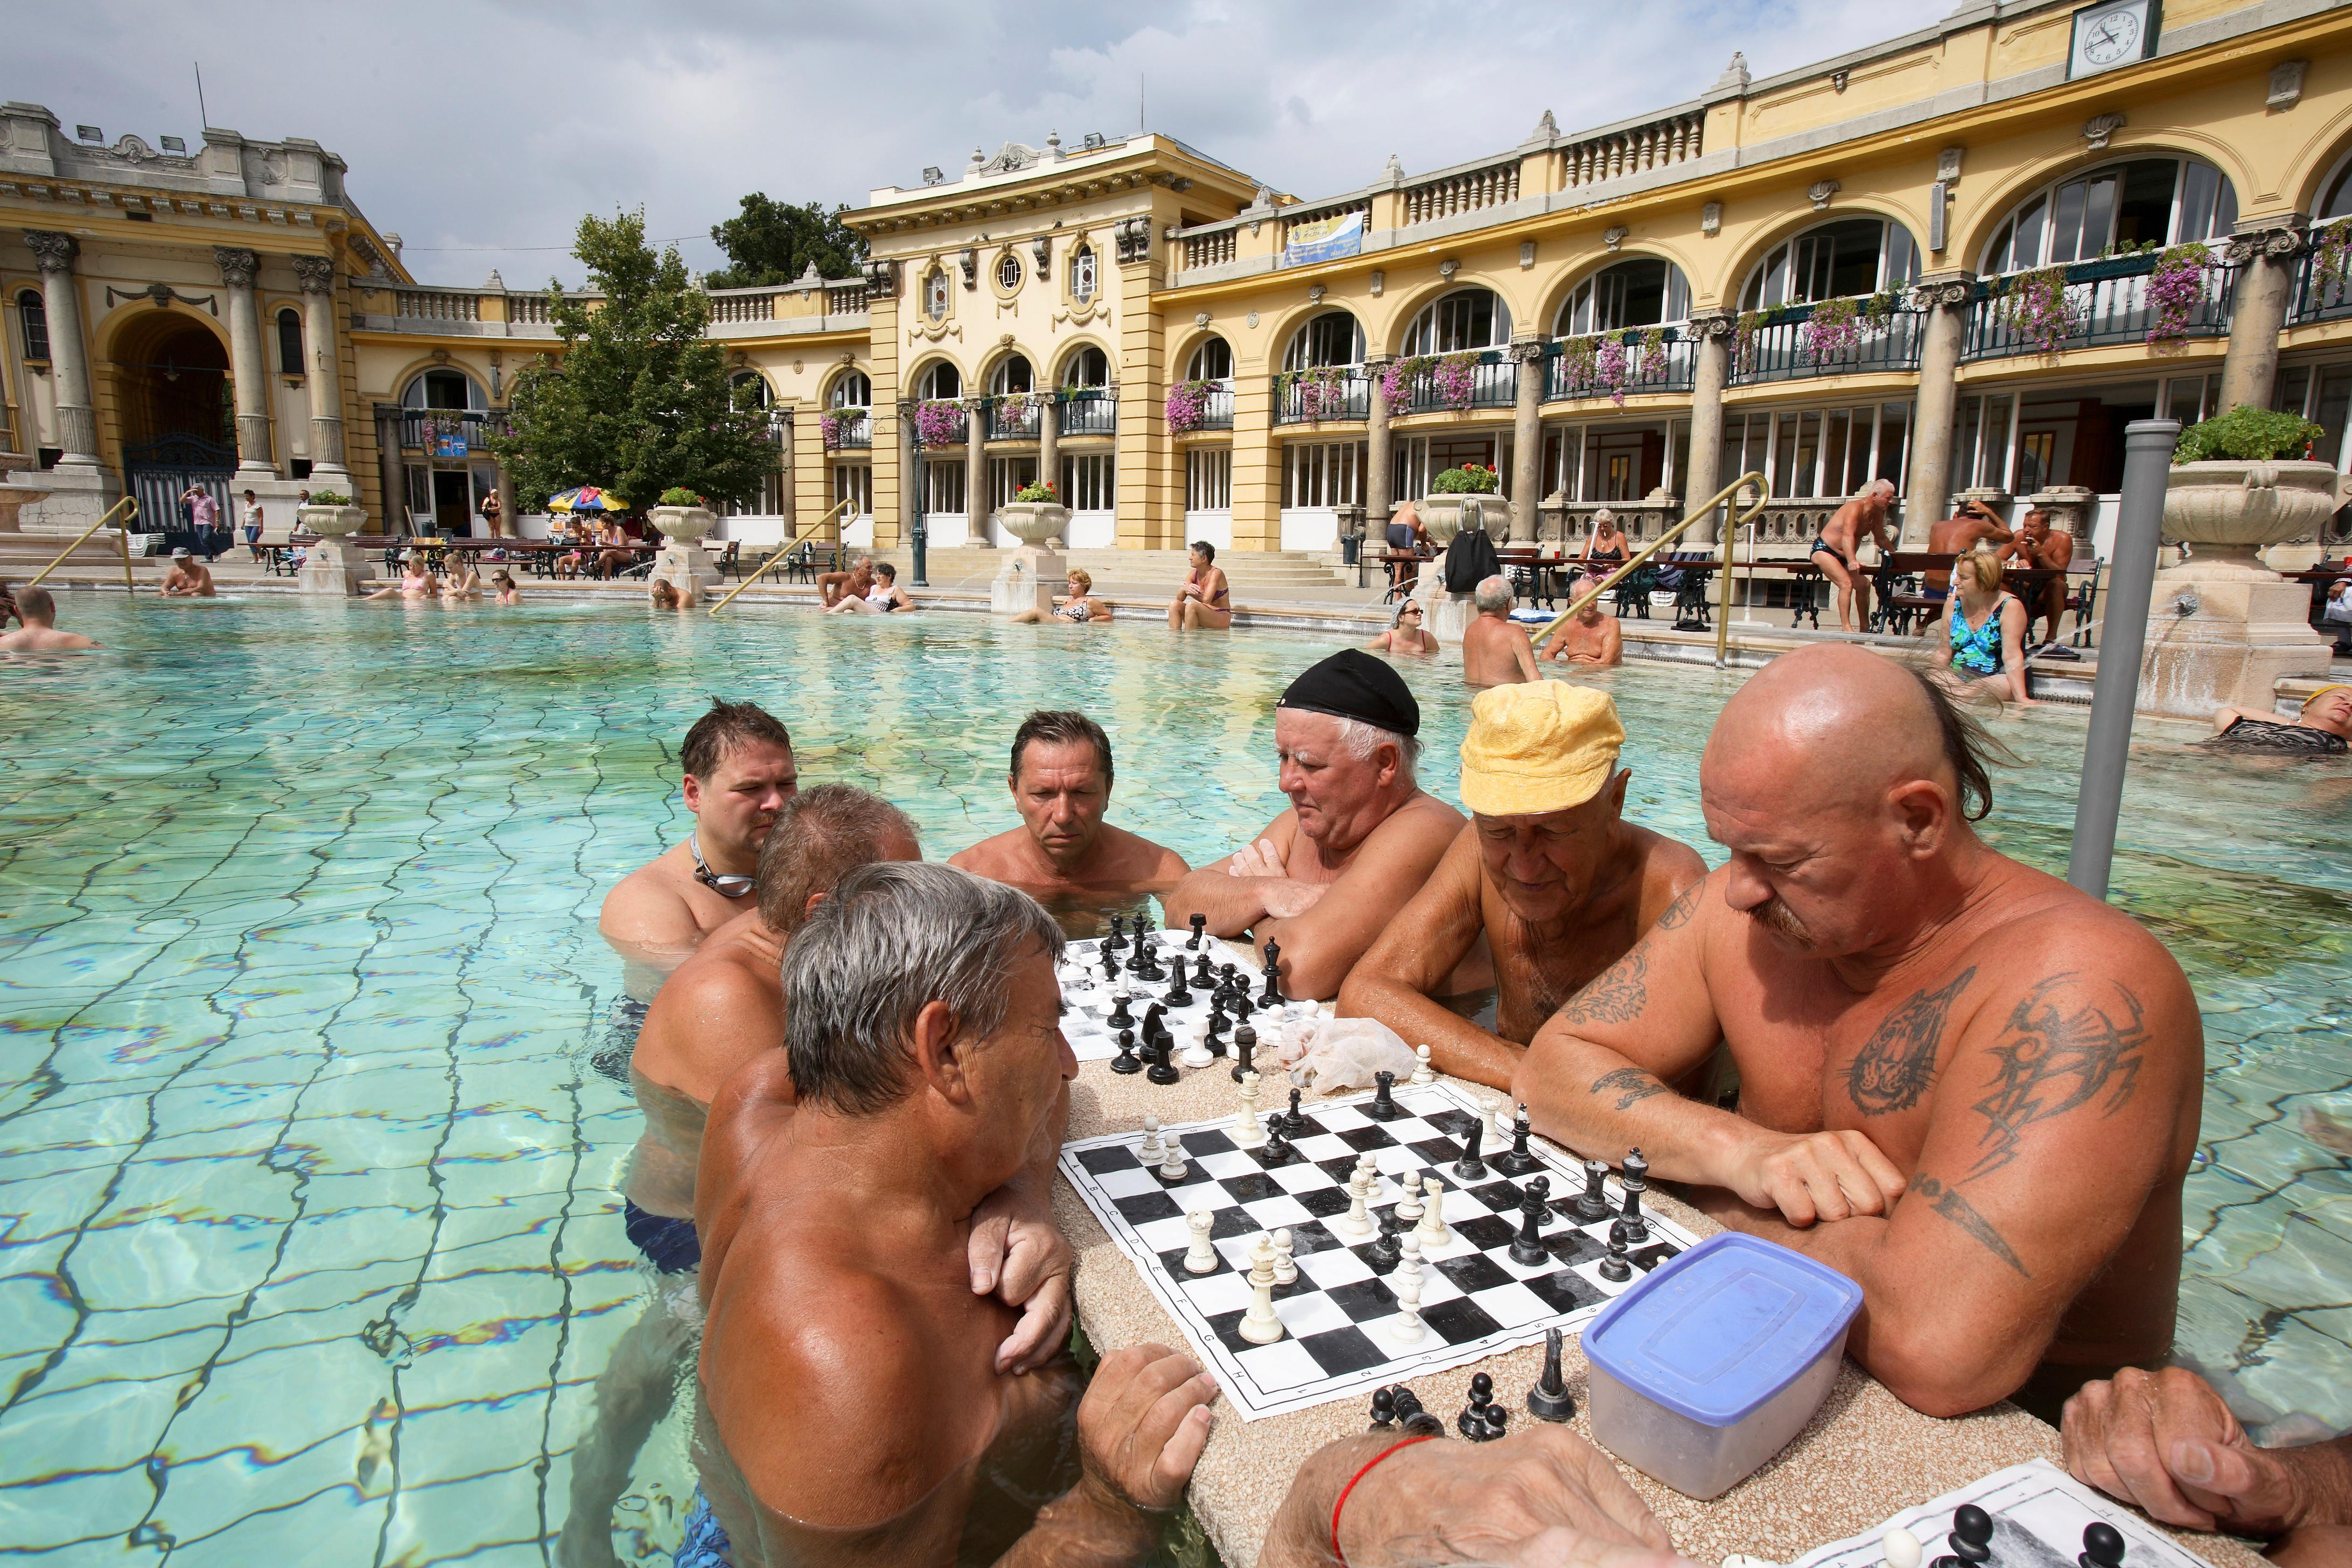 Buy a classic Guardian photograph: Szechenyi Baths, Budapest, August 2006